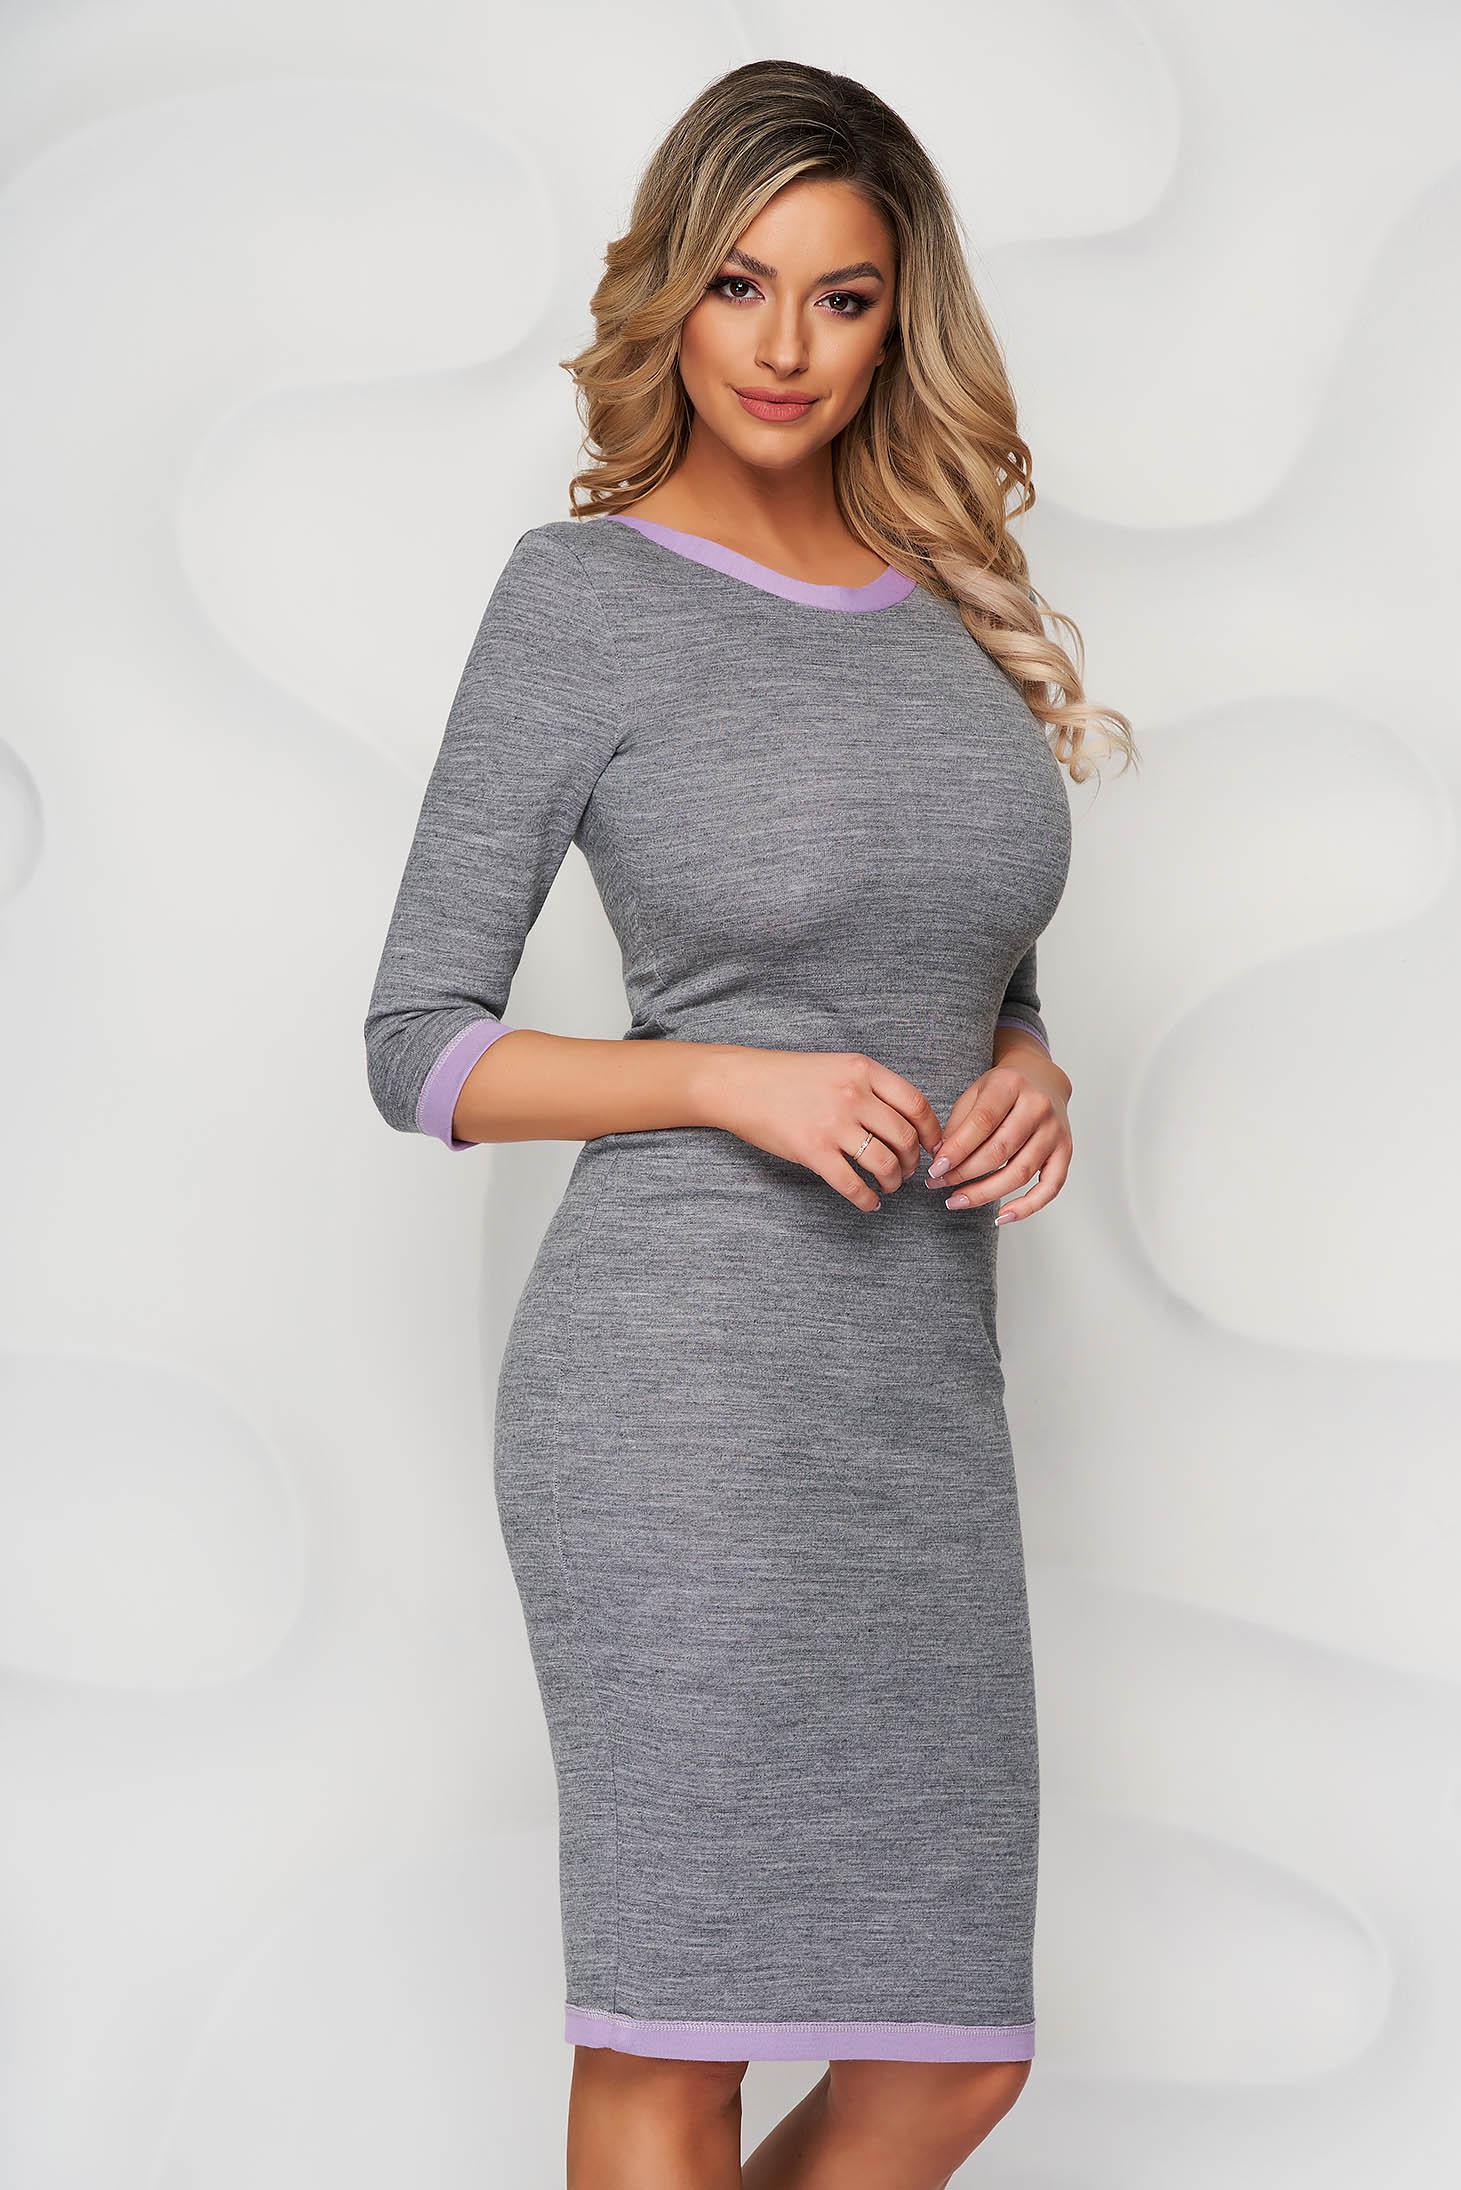 Grey StarShinerS dress